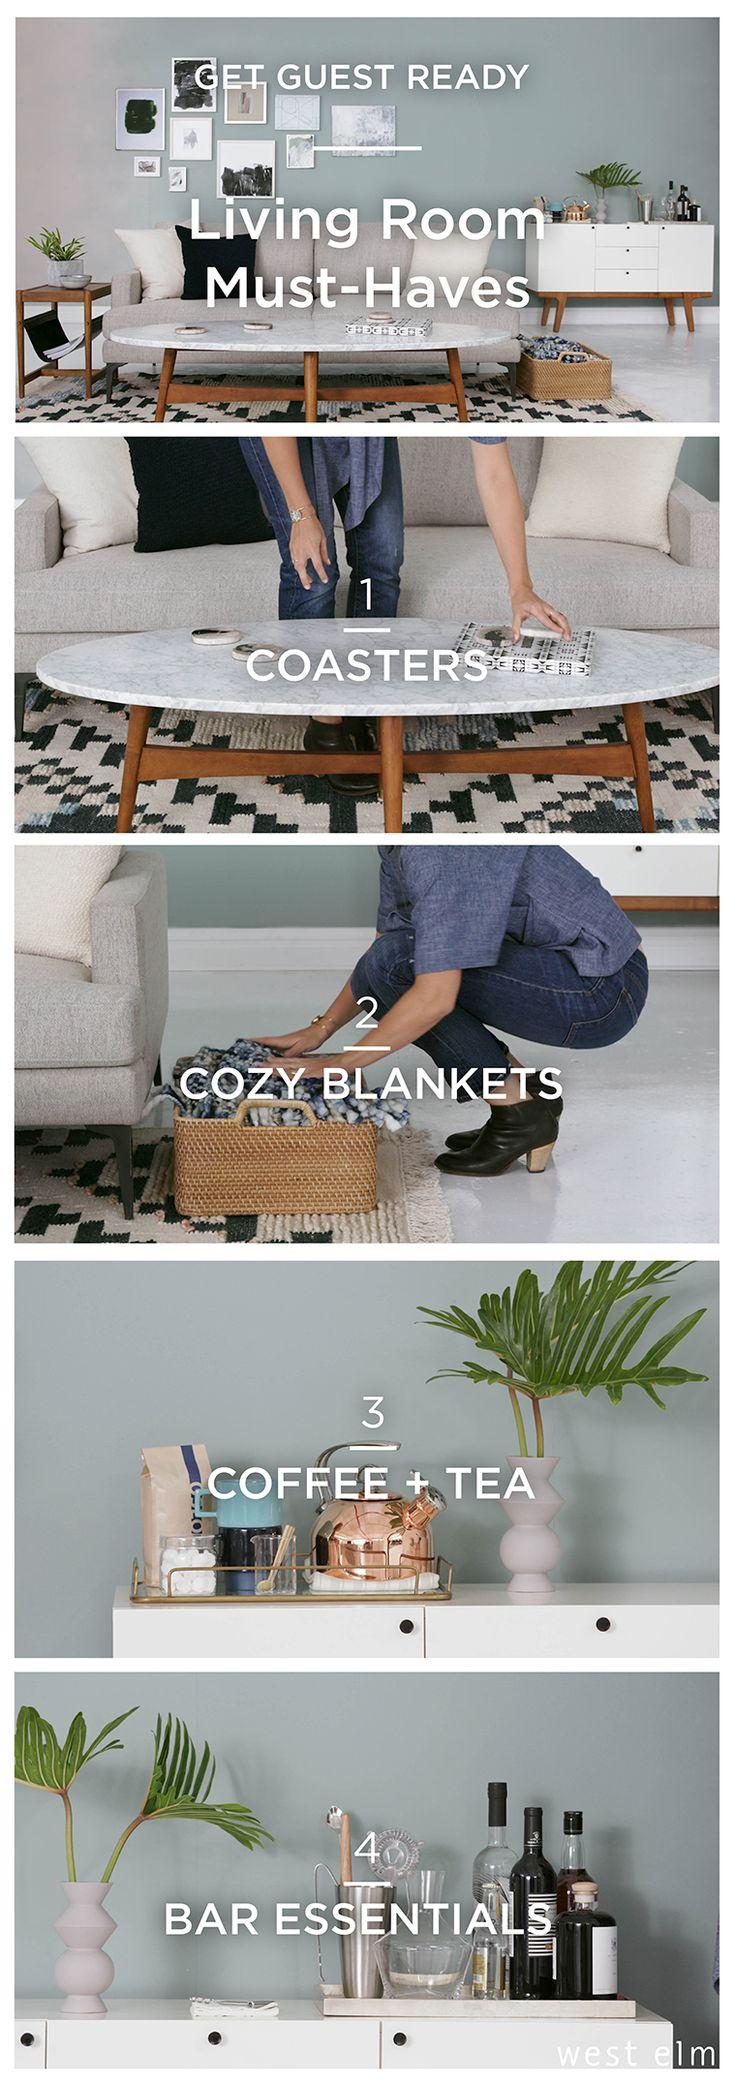 Best Living Images On Pinterest - Living room essentials